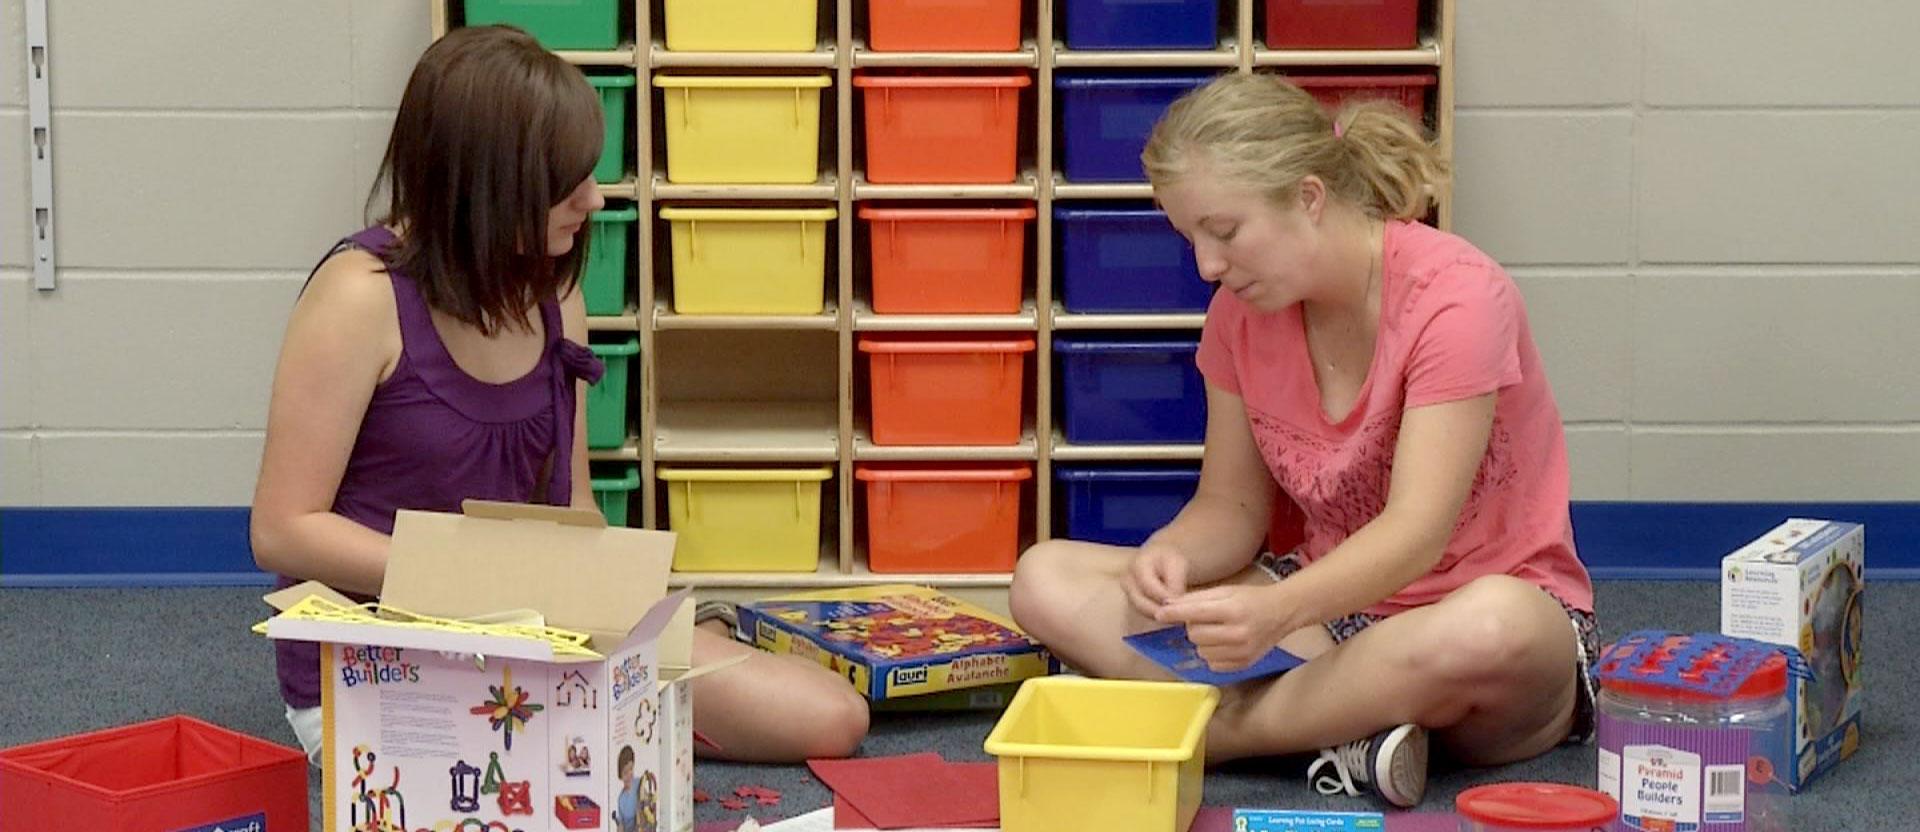 preschools in sioux falls sd sioux falls school district doubling preschool locations 402